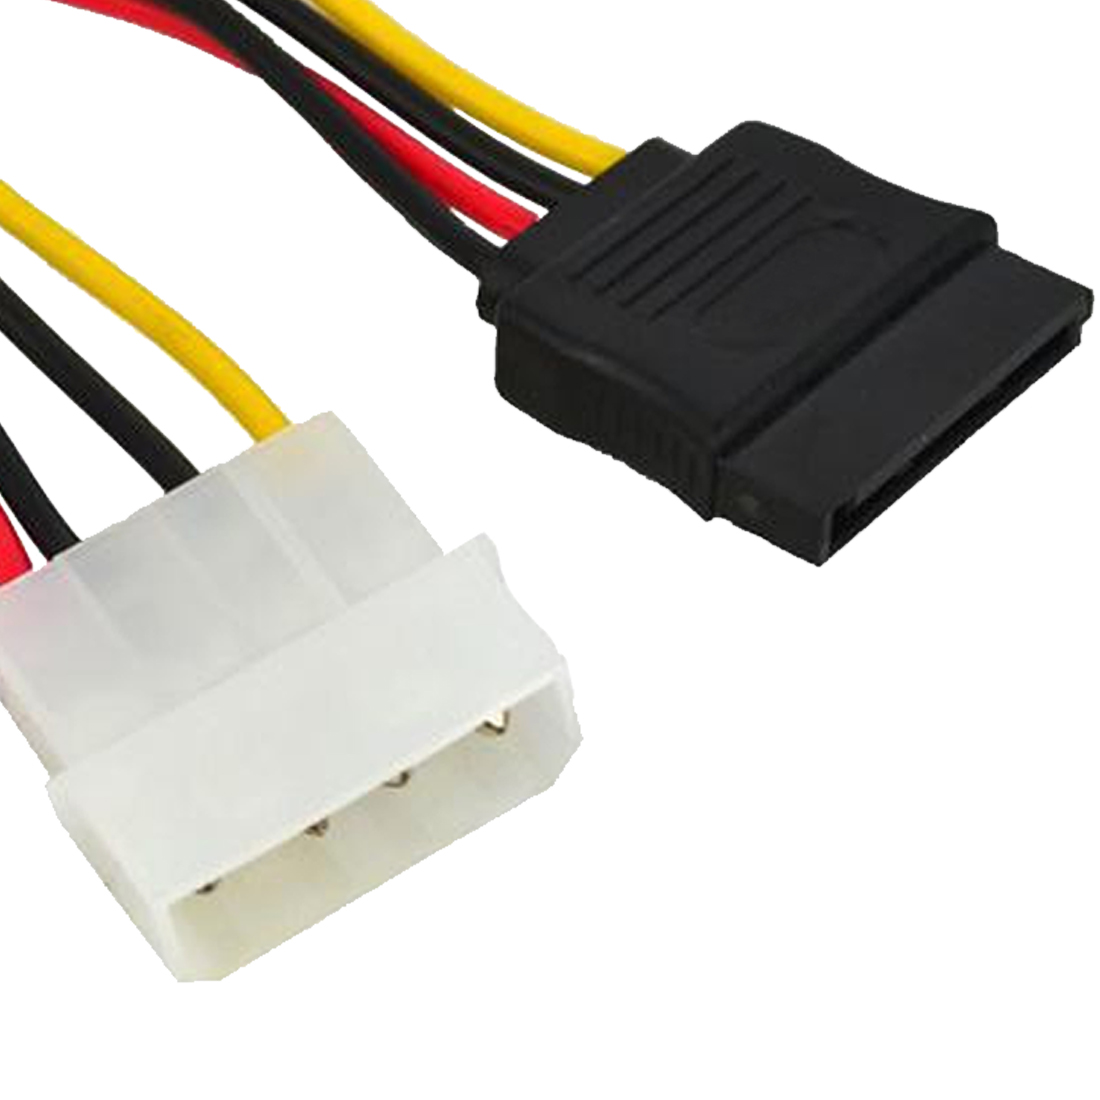 Image 2 - Marsnaska отличный 1 шт. Serial ATA SATA 4 Pin IDE до 15 Pin HDD адаптер питания кабель жесткого диска адаптер штекер женский кабель